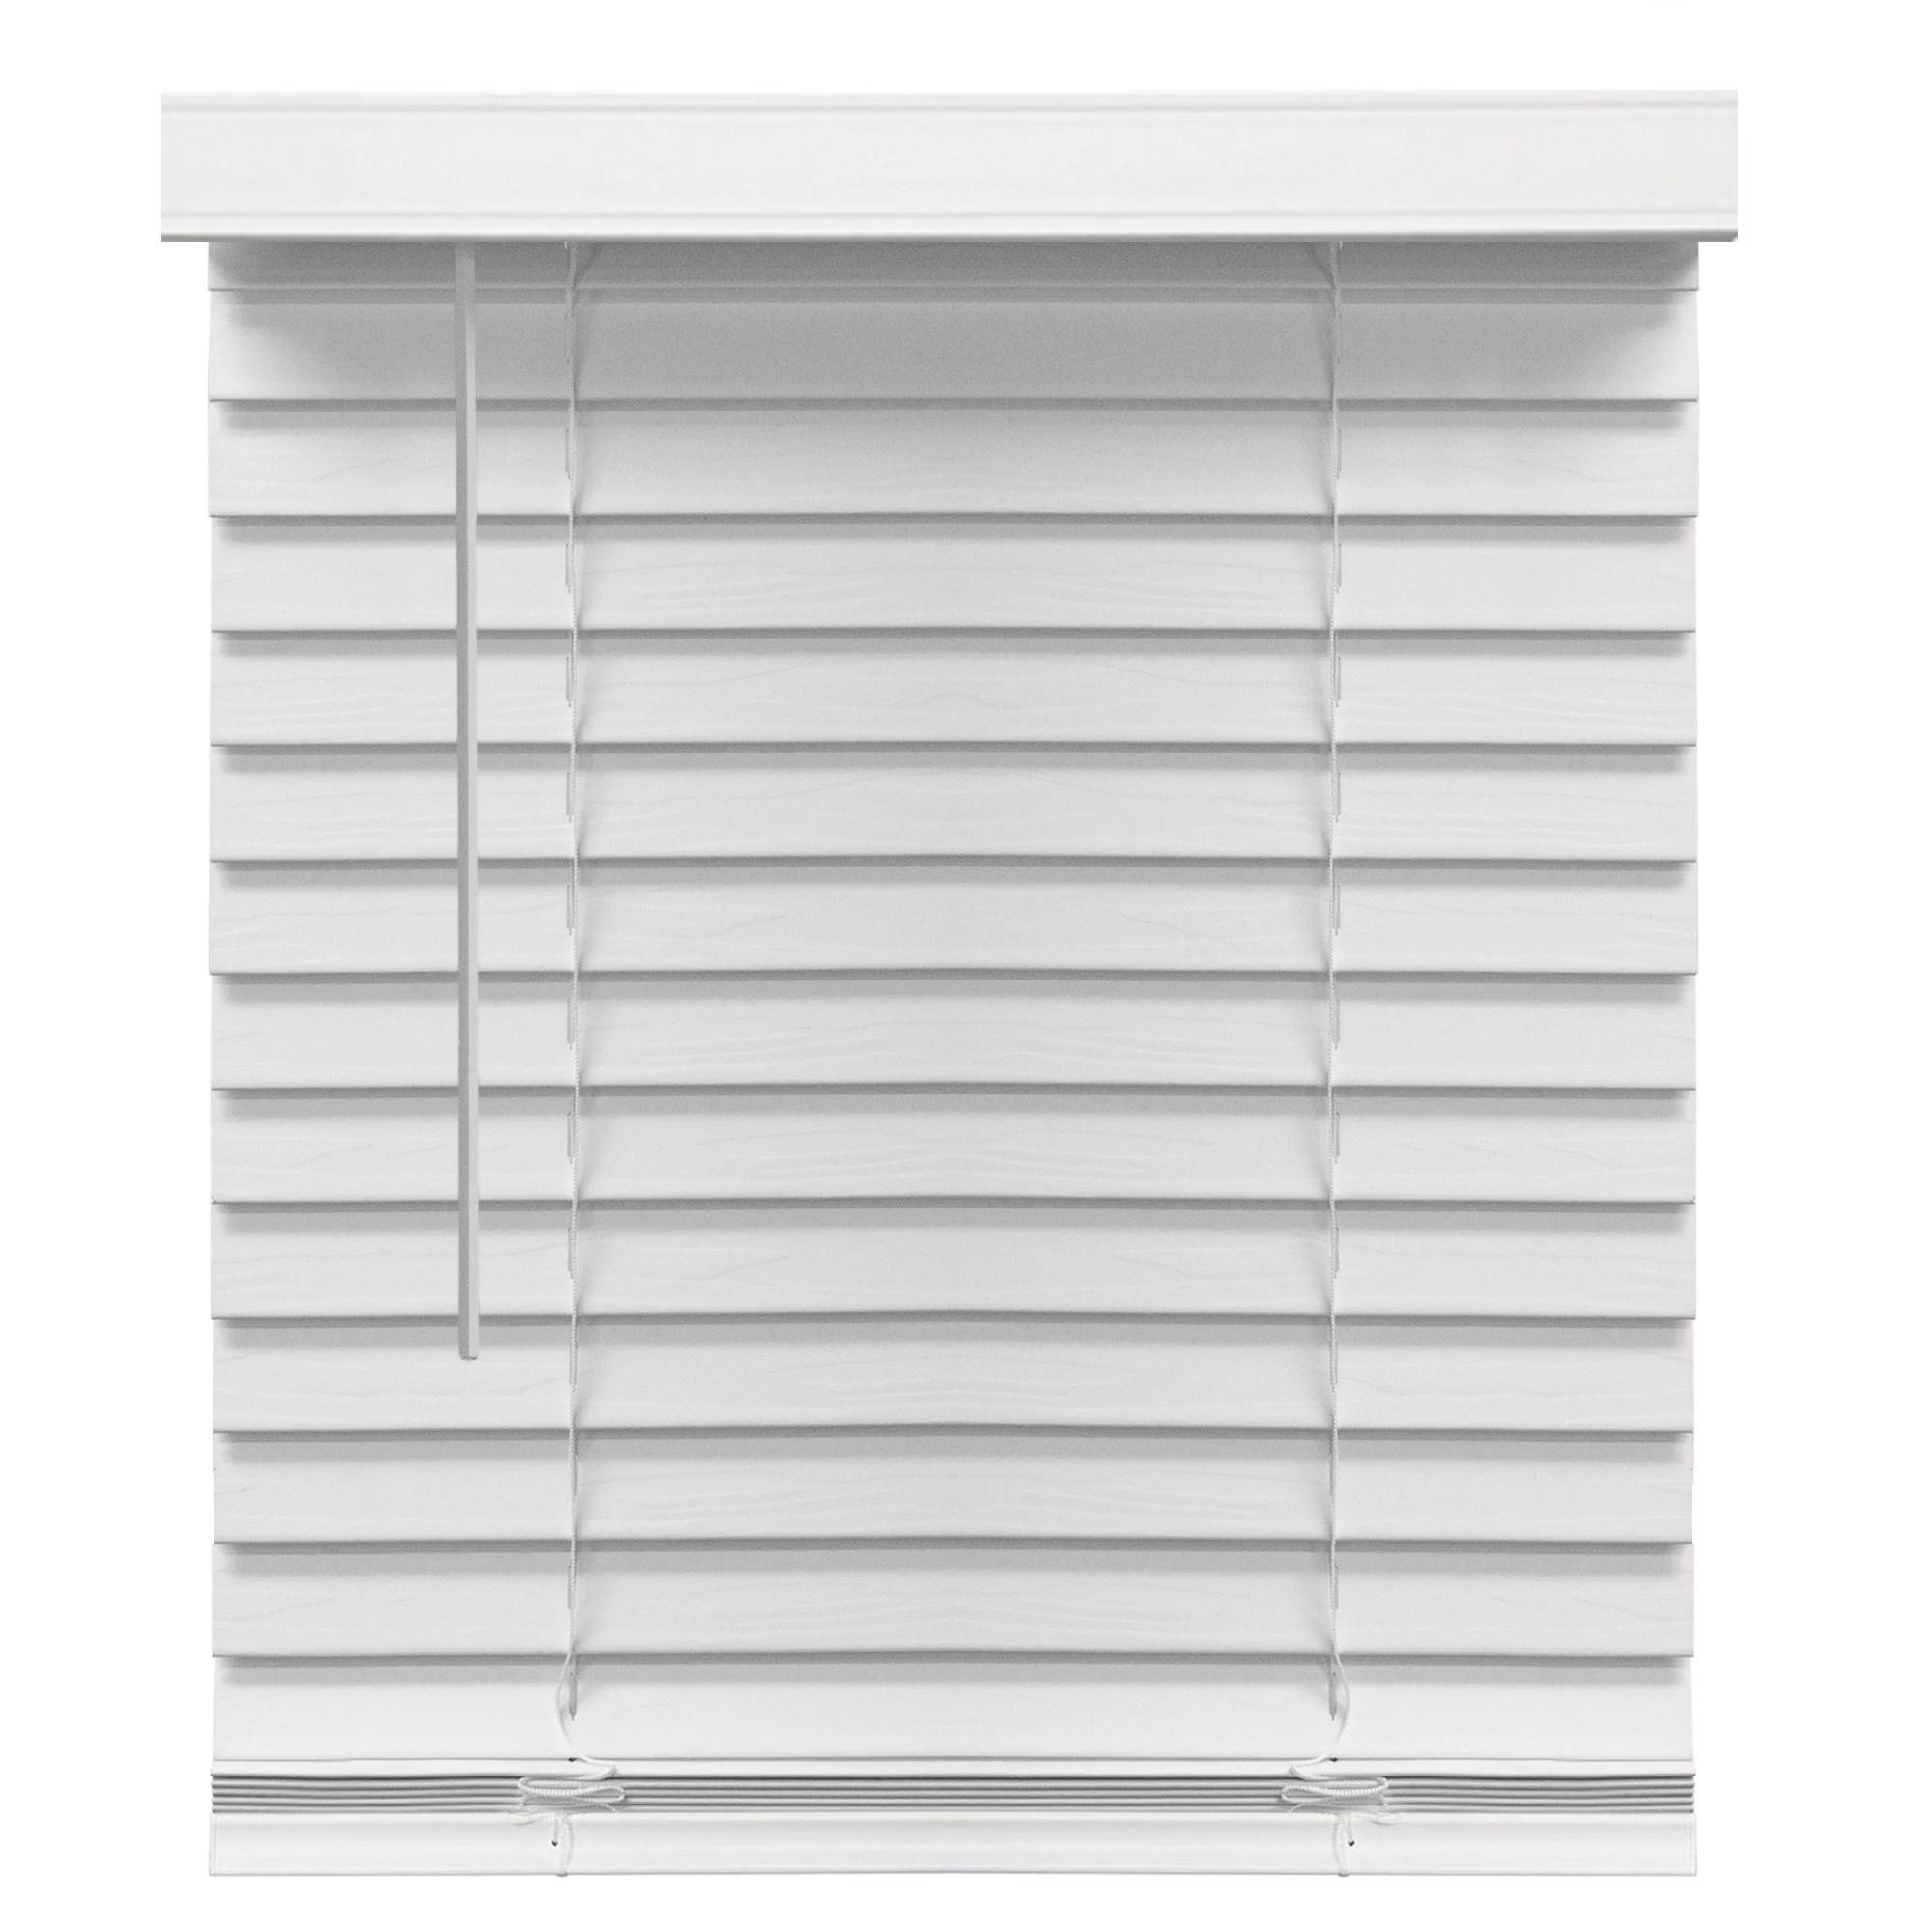 richfield studios 2 cordless faux wood blinds white